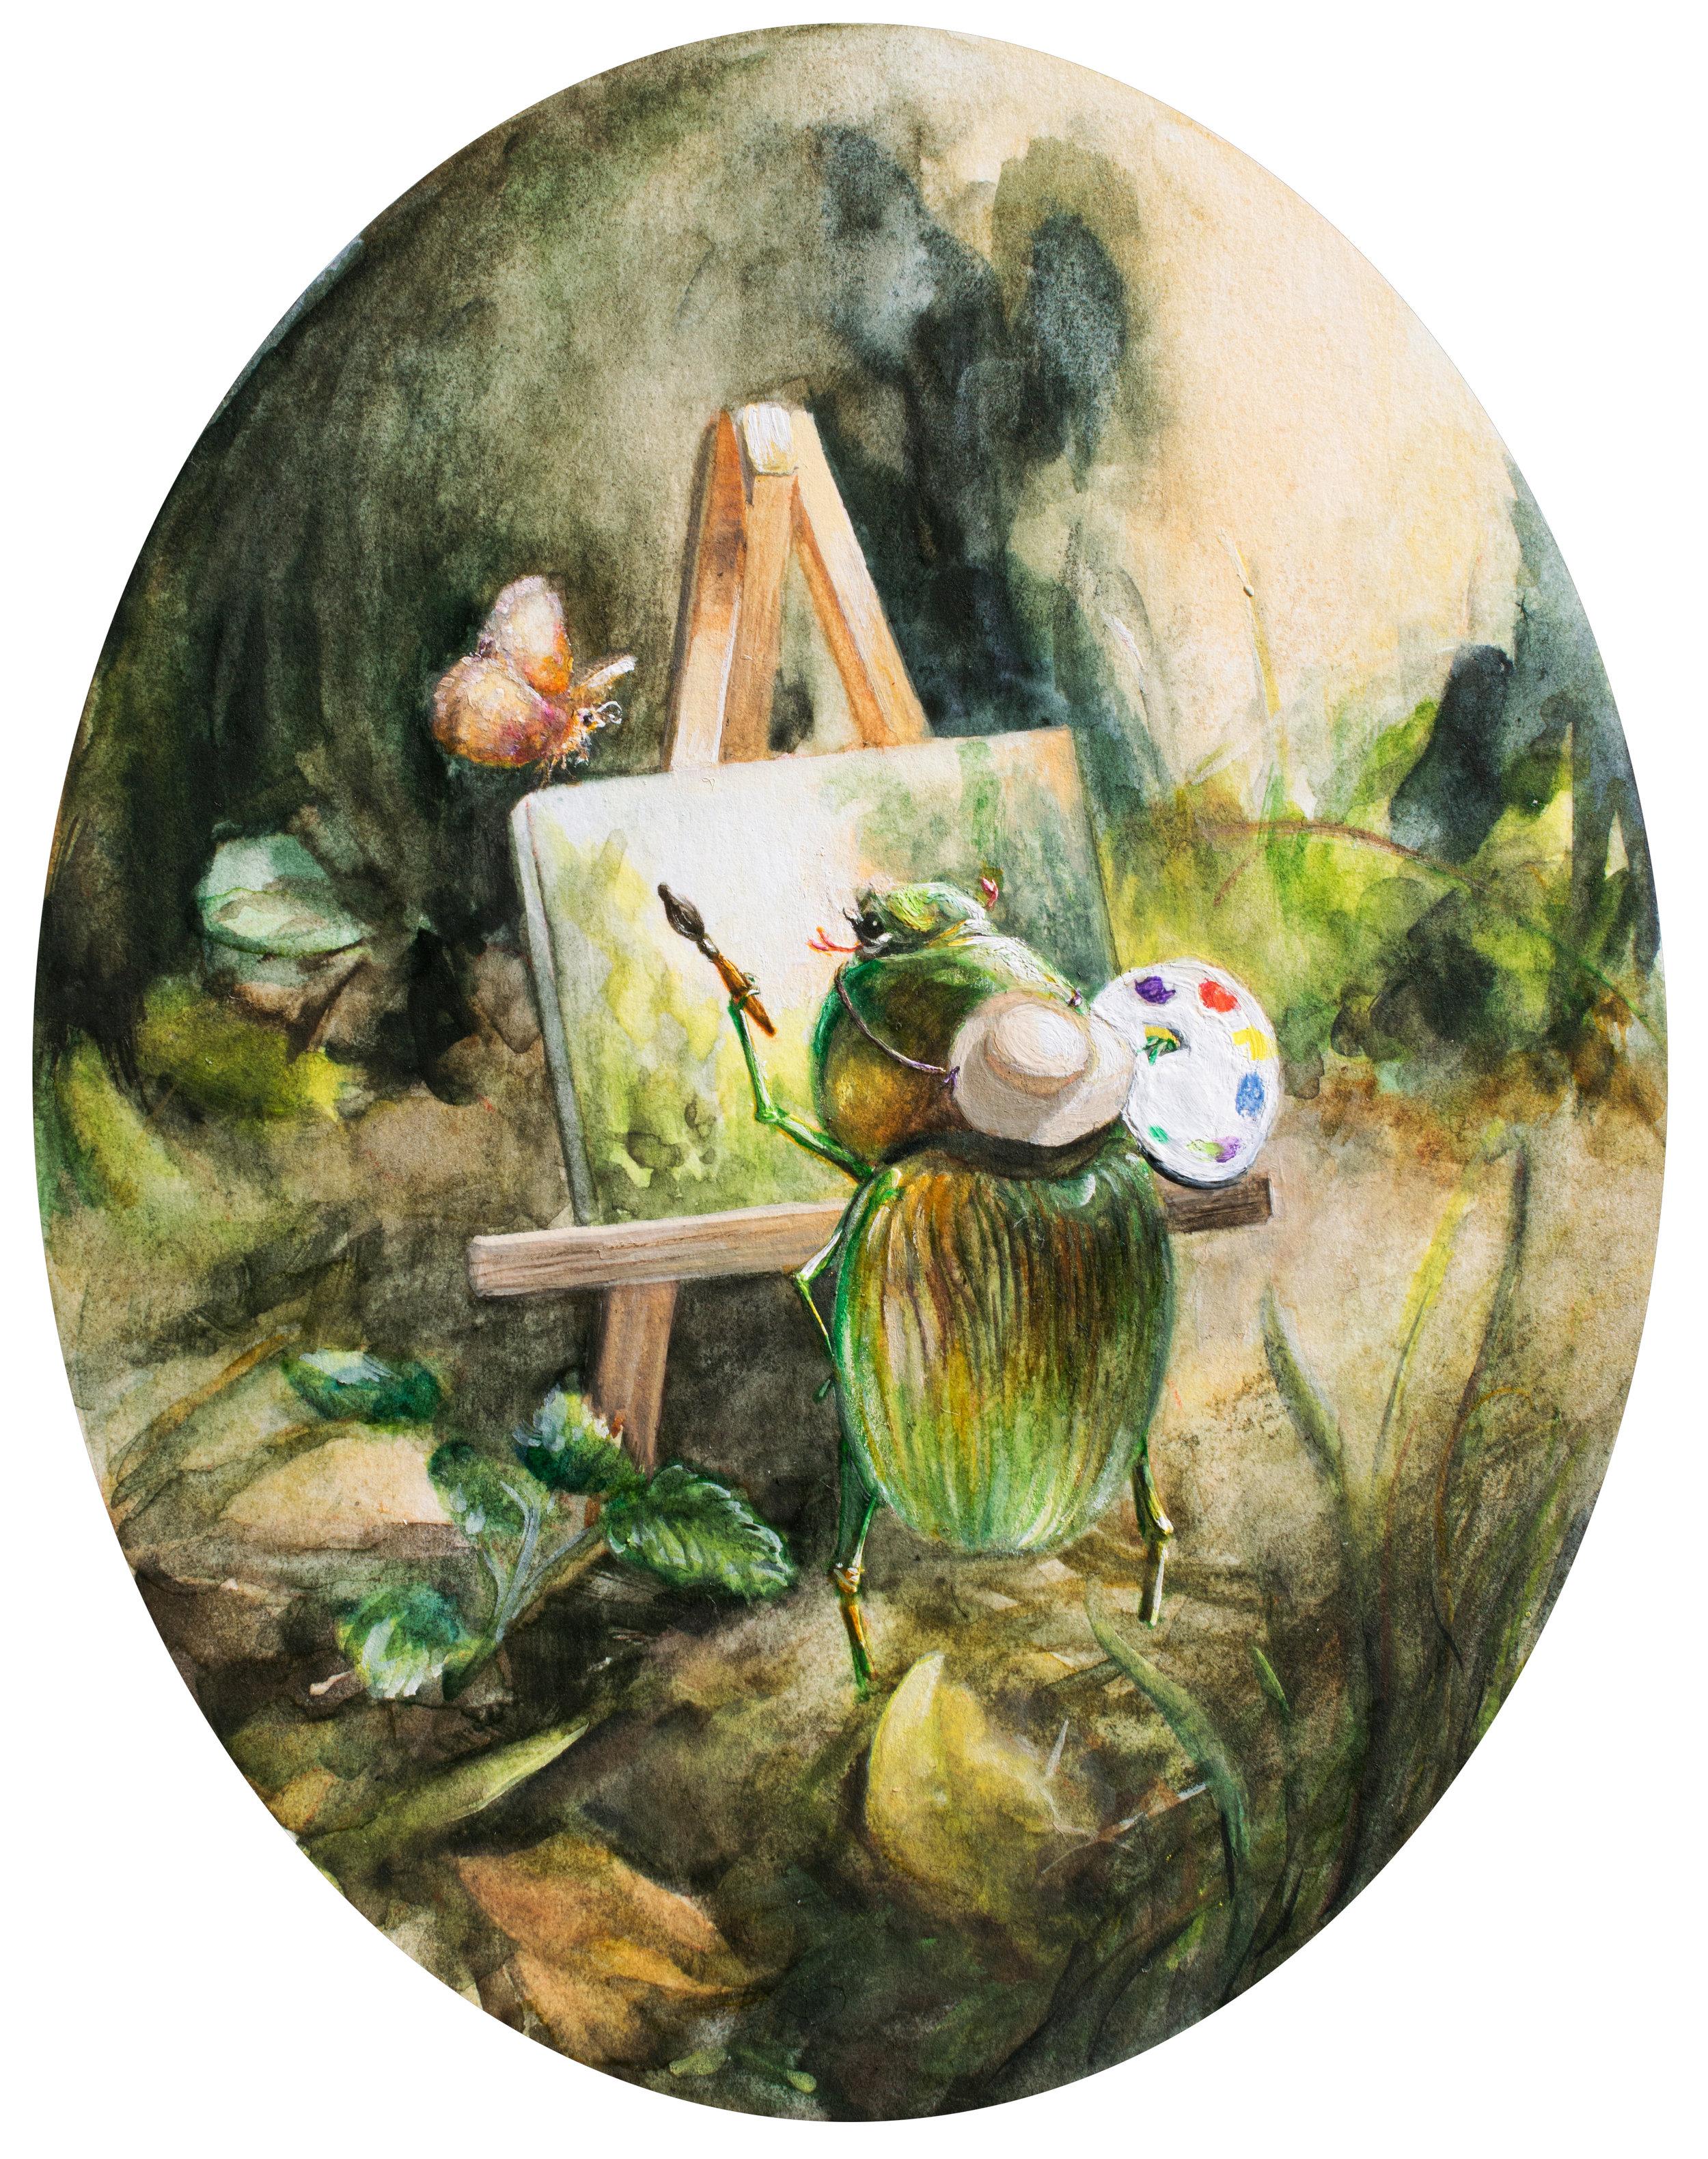 Painting the Landscape copy.jpg